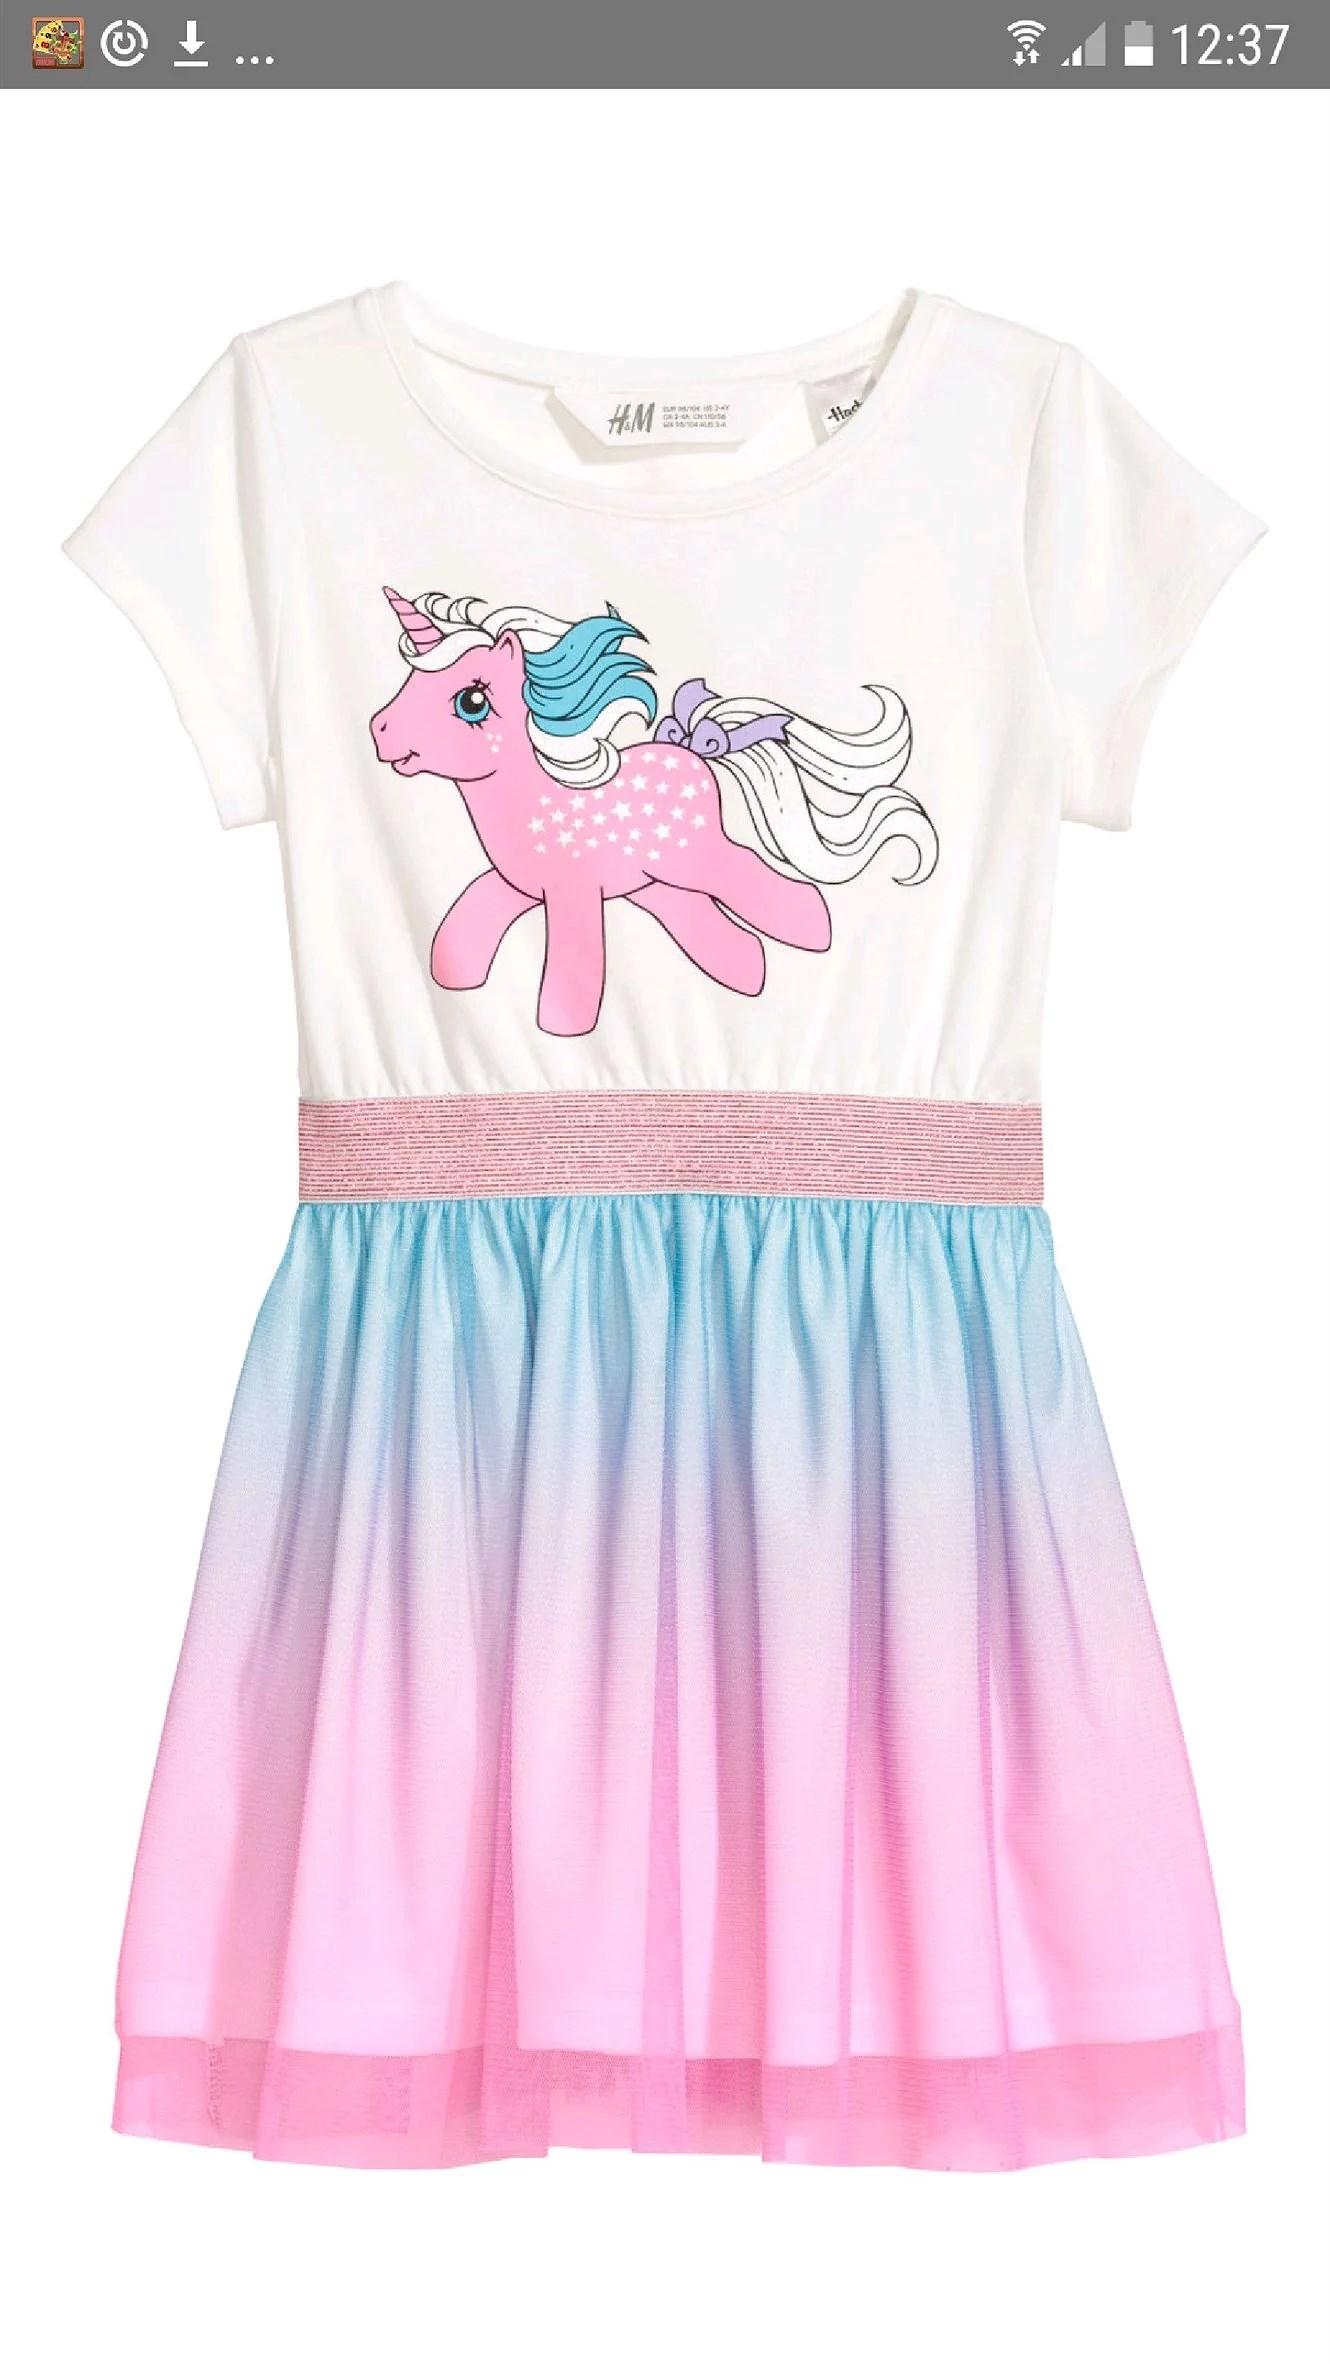 Ponys 💕